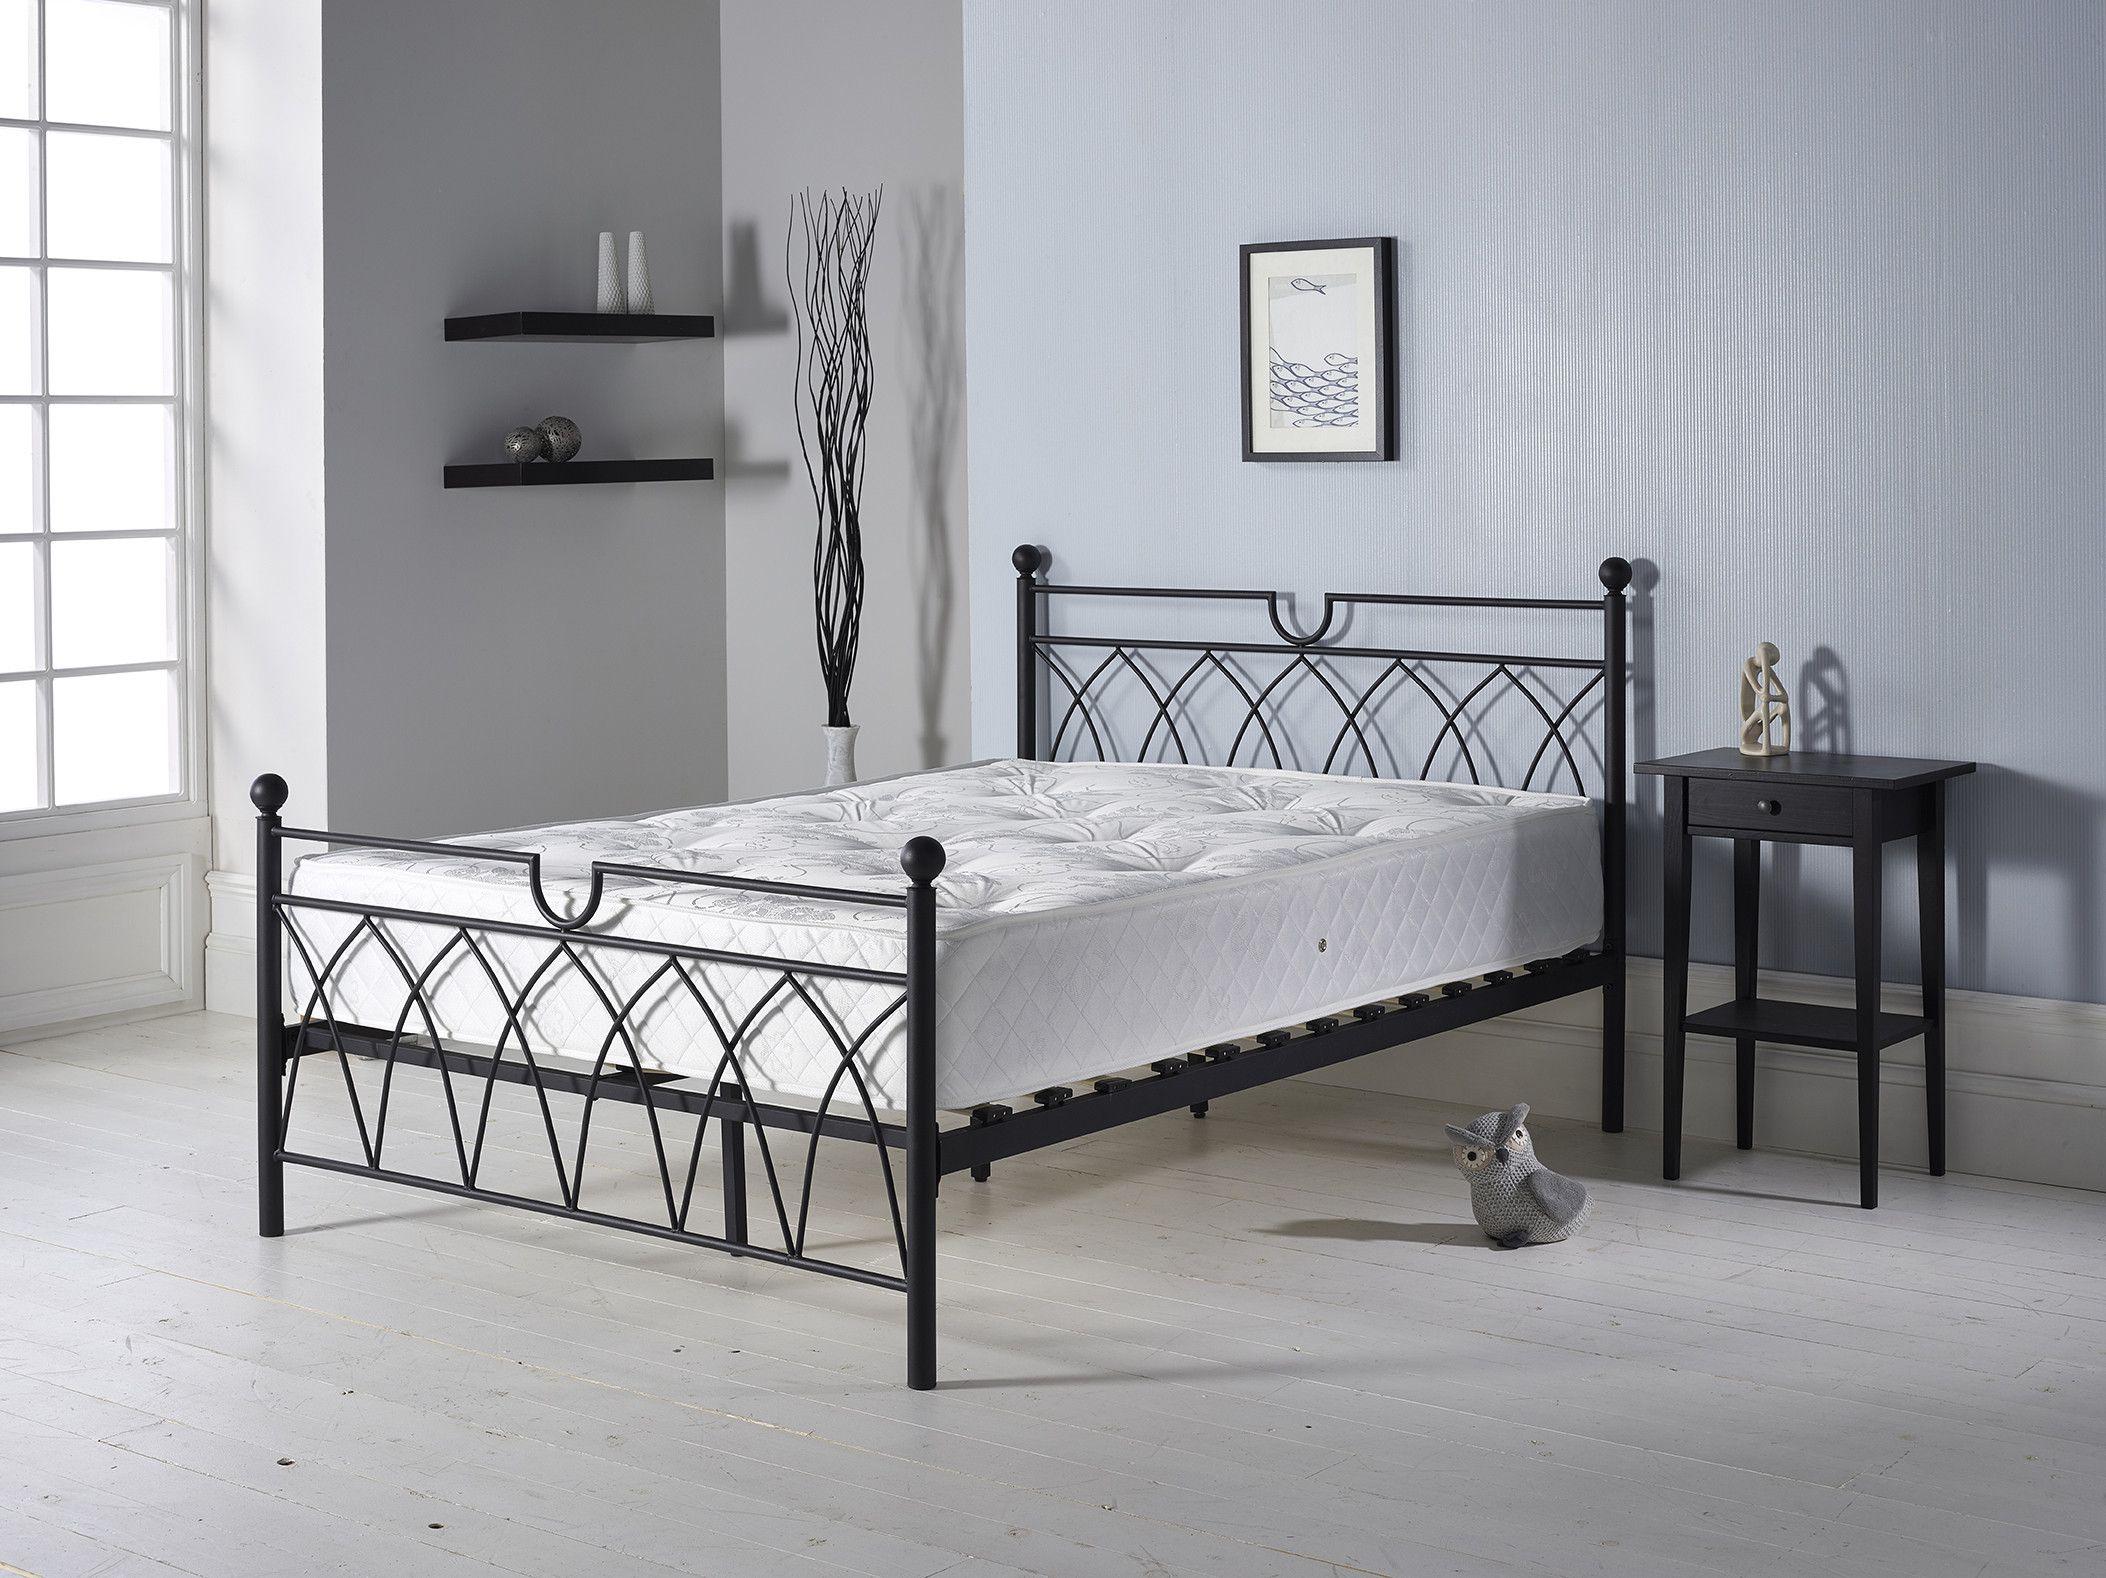 Metal double bed in black pinterest metal double bed double